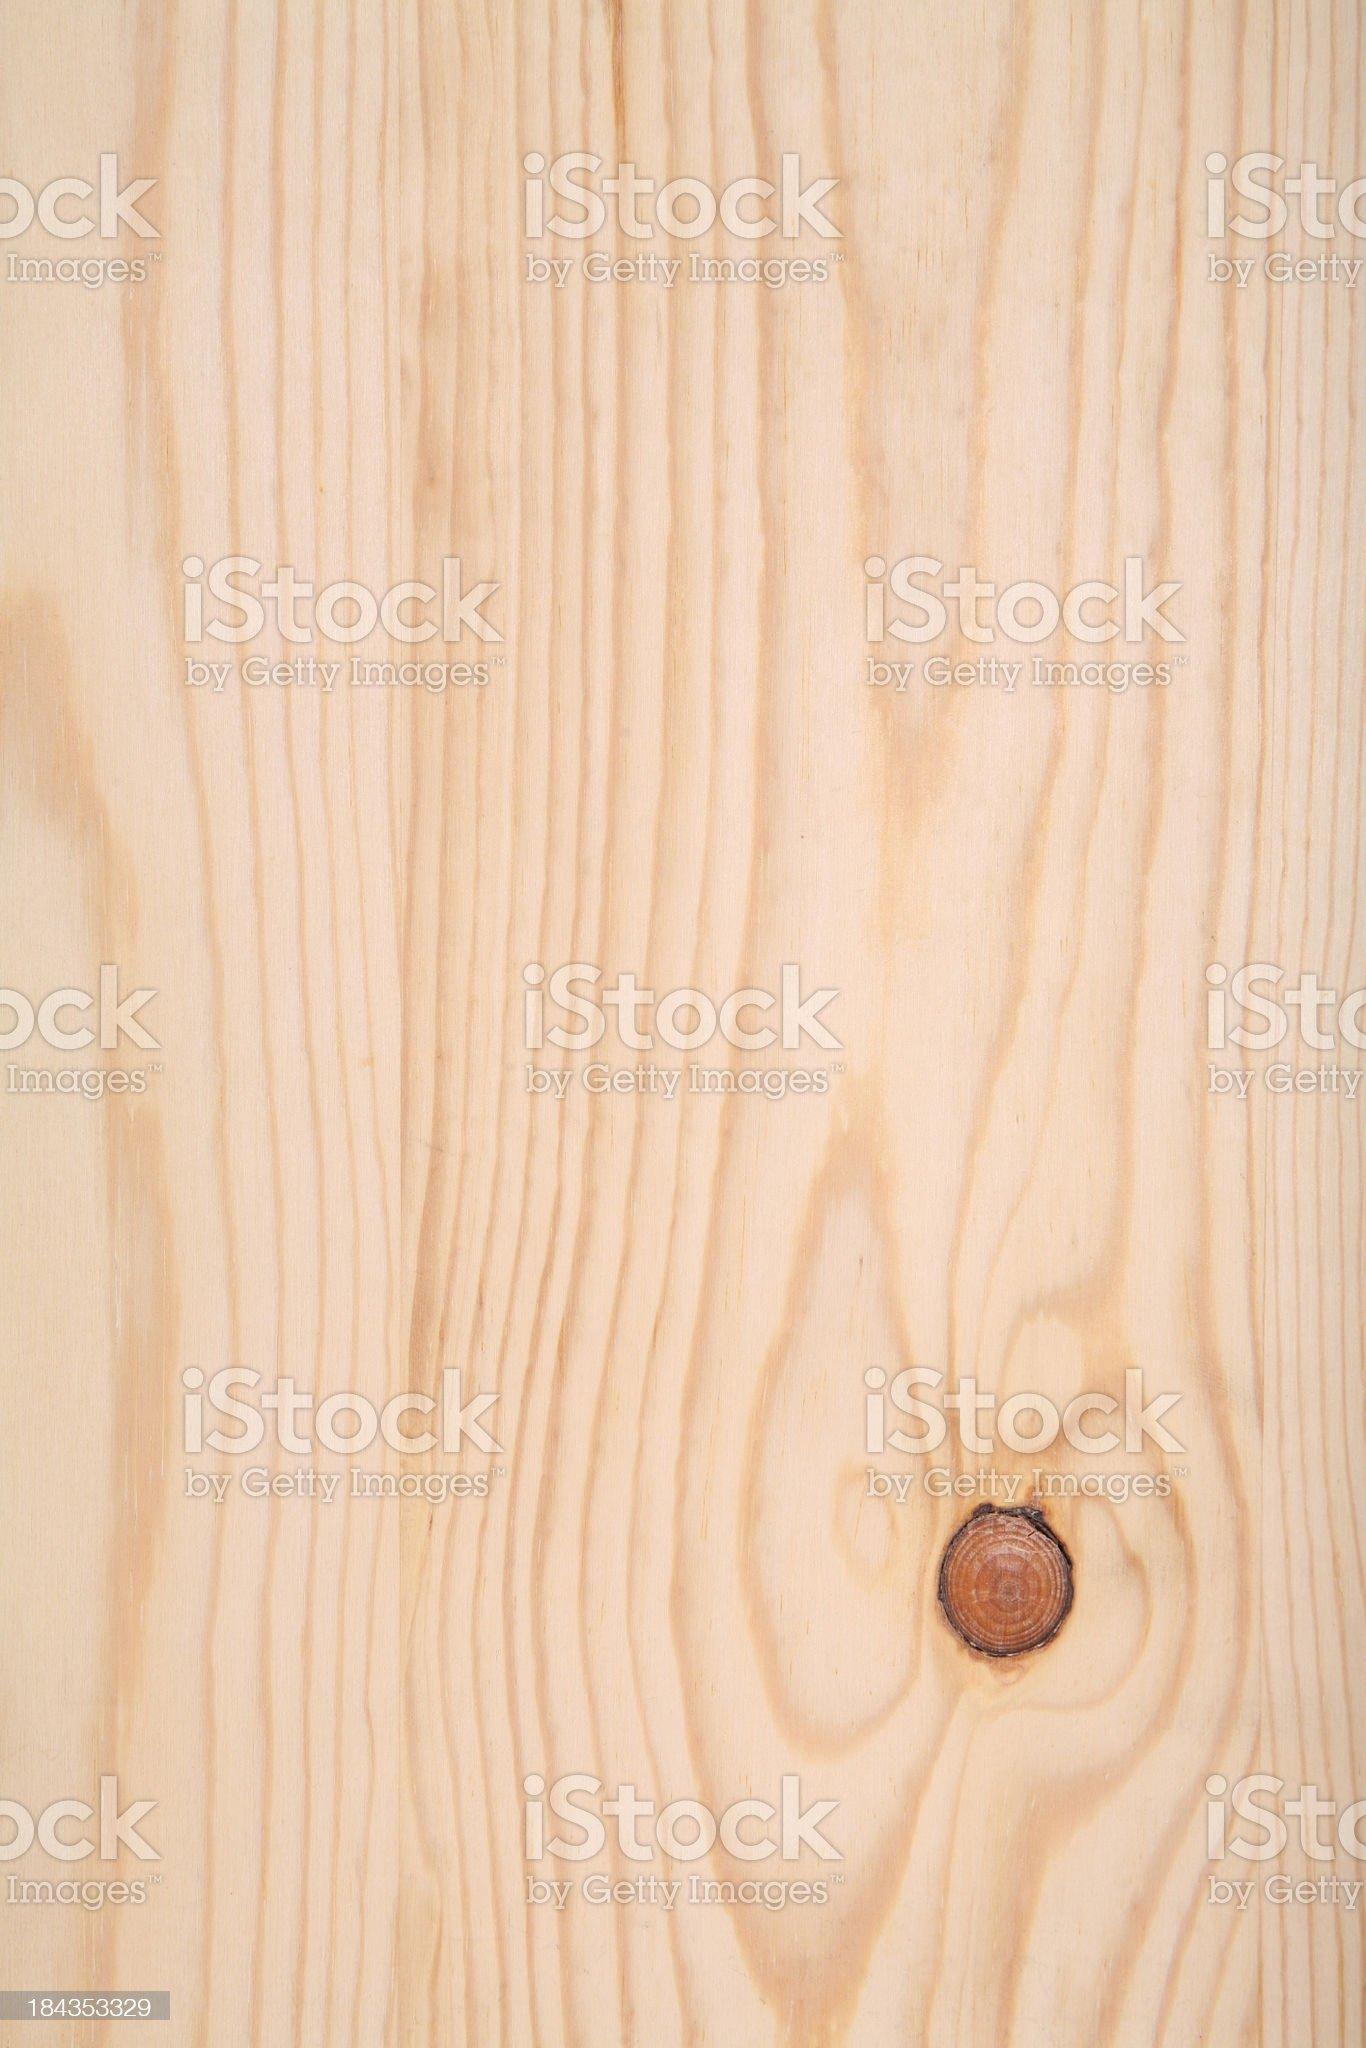 Pine Wood Background royalty-free stock photo